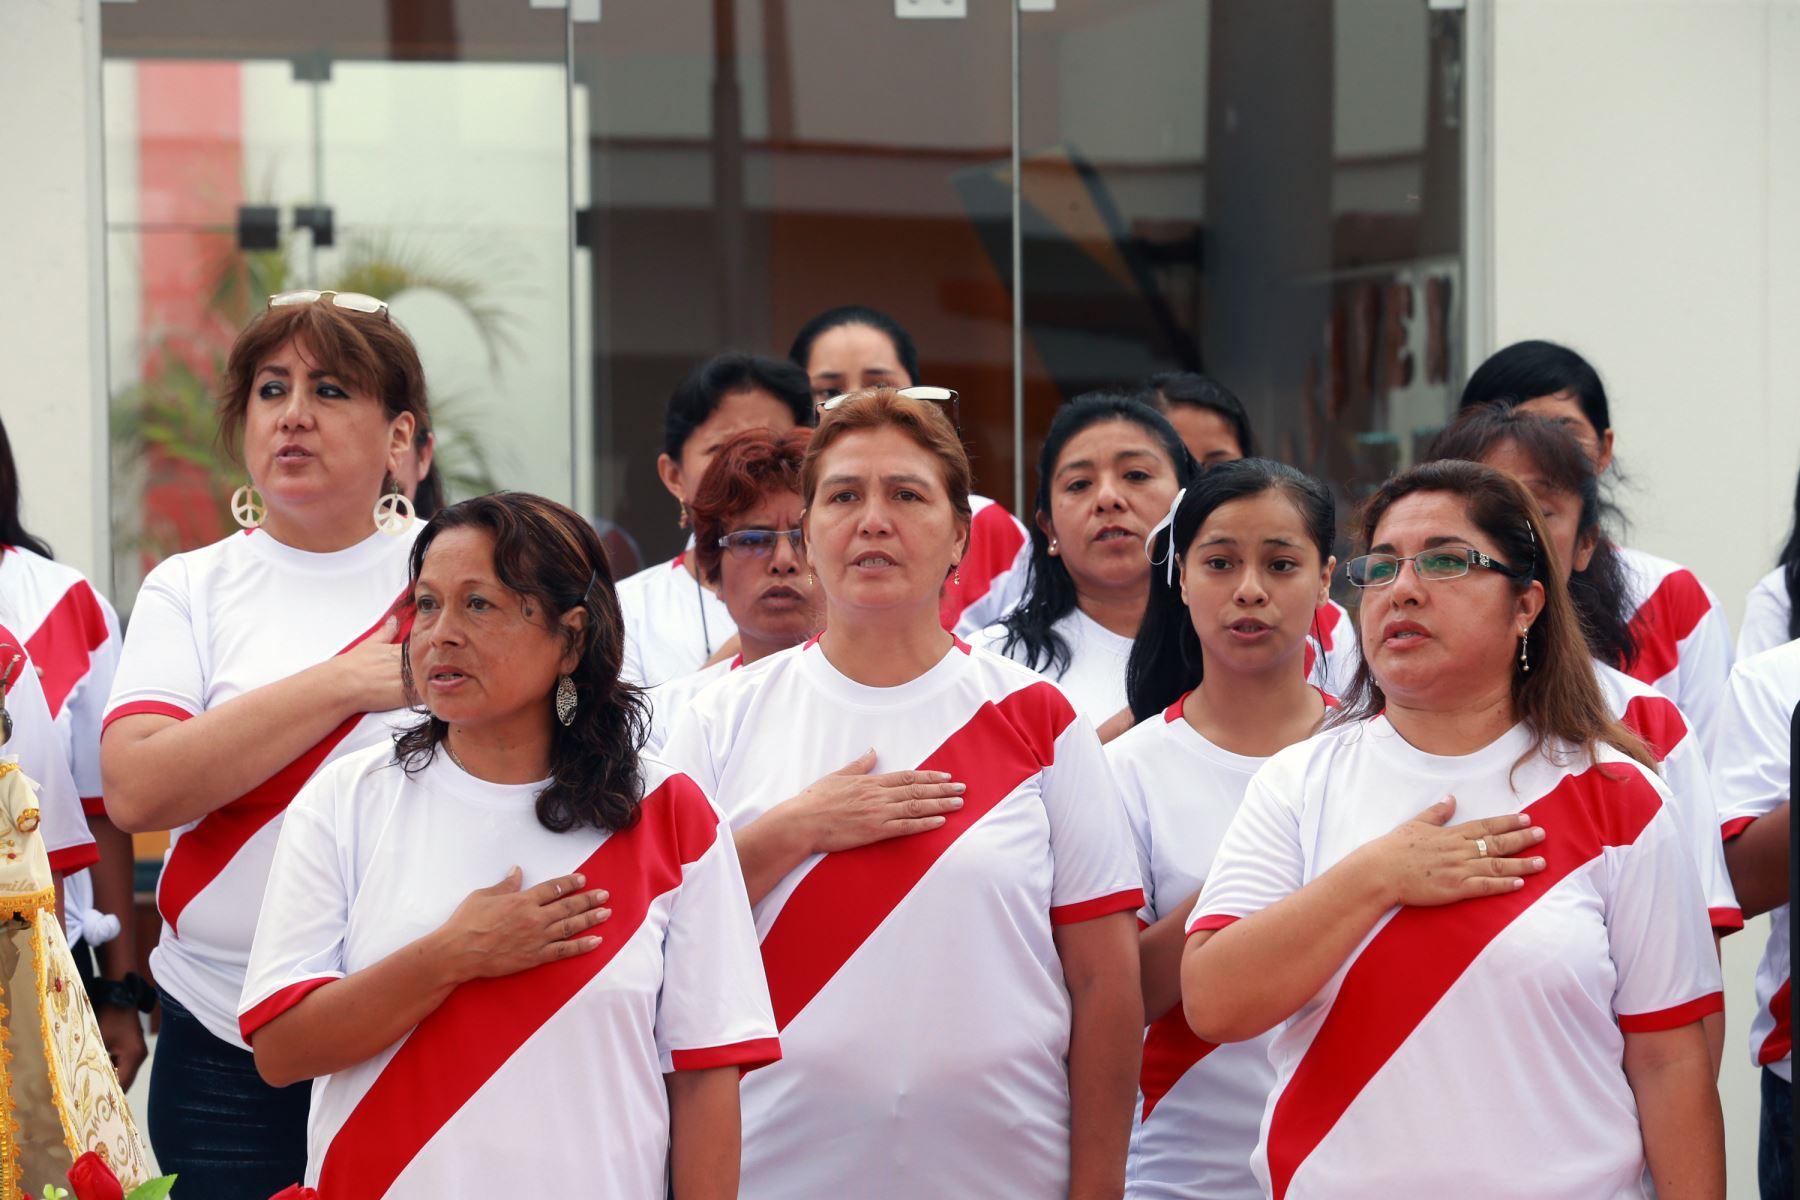 Ministra de Relaciones Exteriores, Cayetana Aljovín  escolta  de la  ,  escuela de Pachacámac. Foto: ANDINA/Norman Córdova